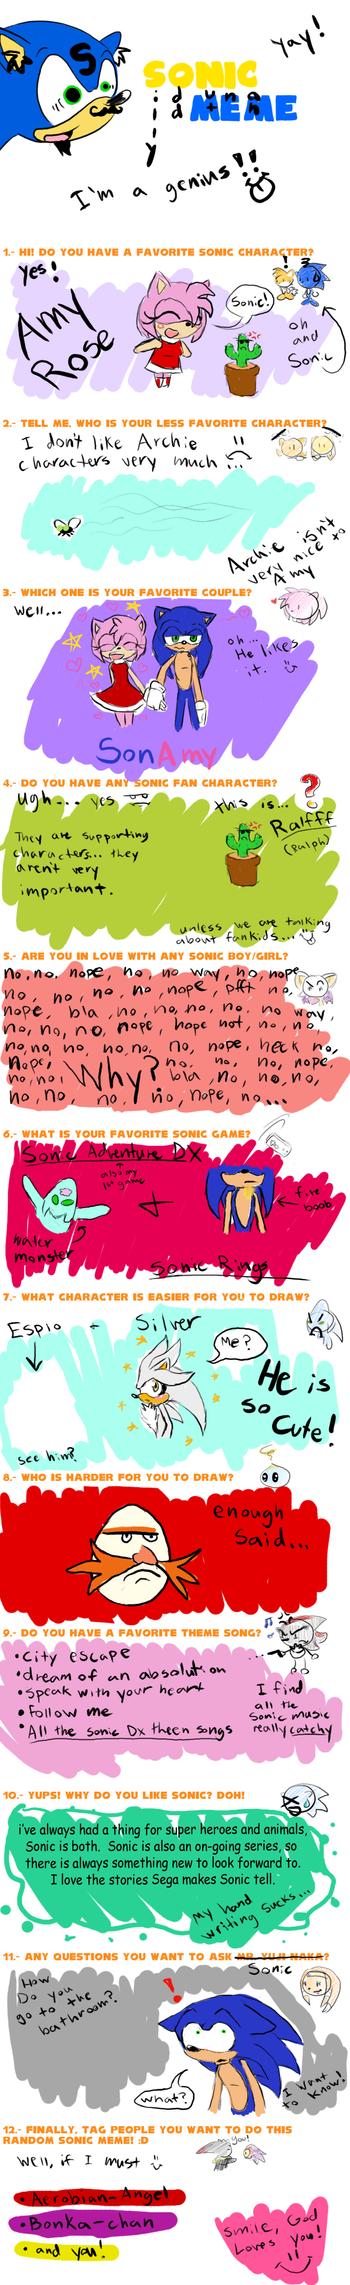 Sonic MEME by GodsSonicGirl